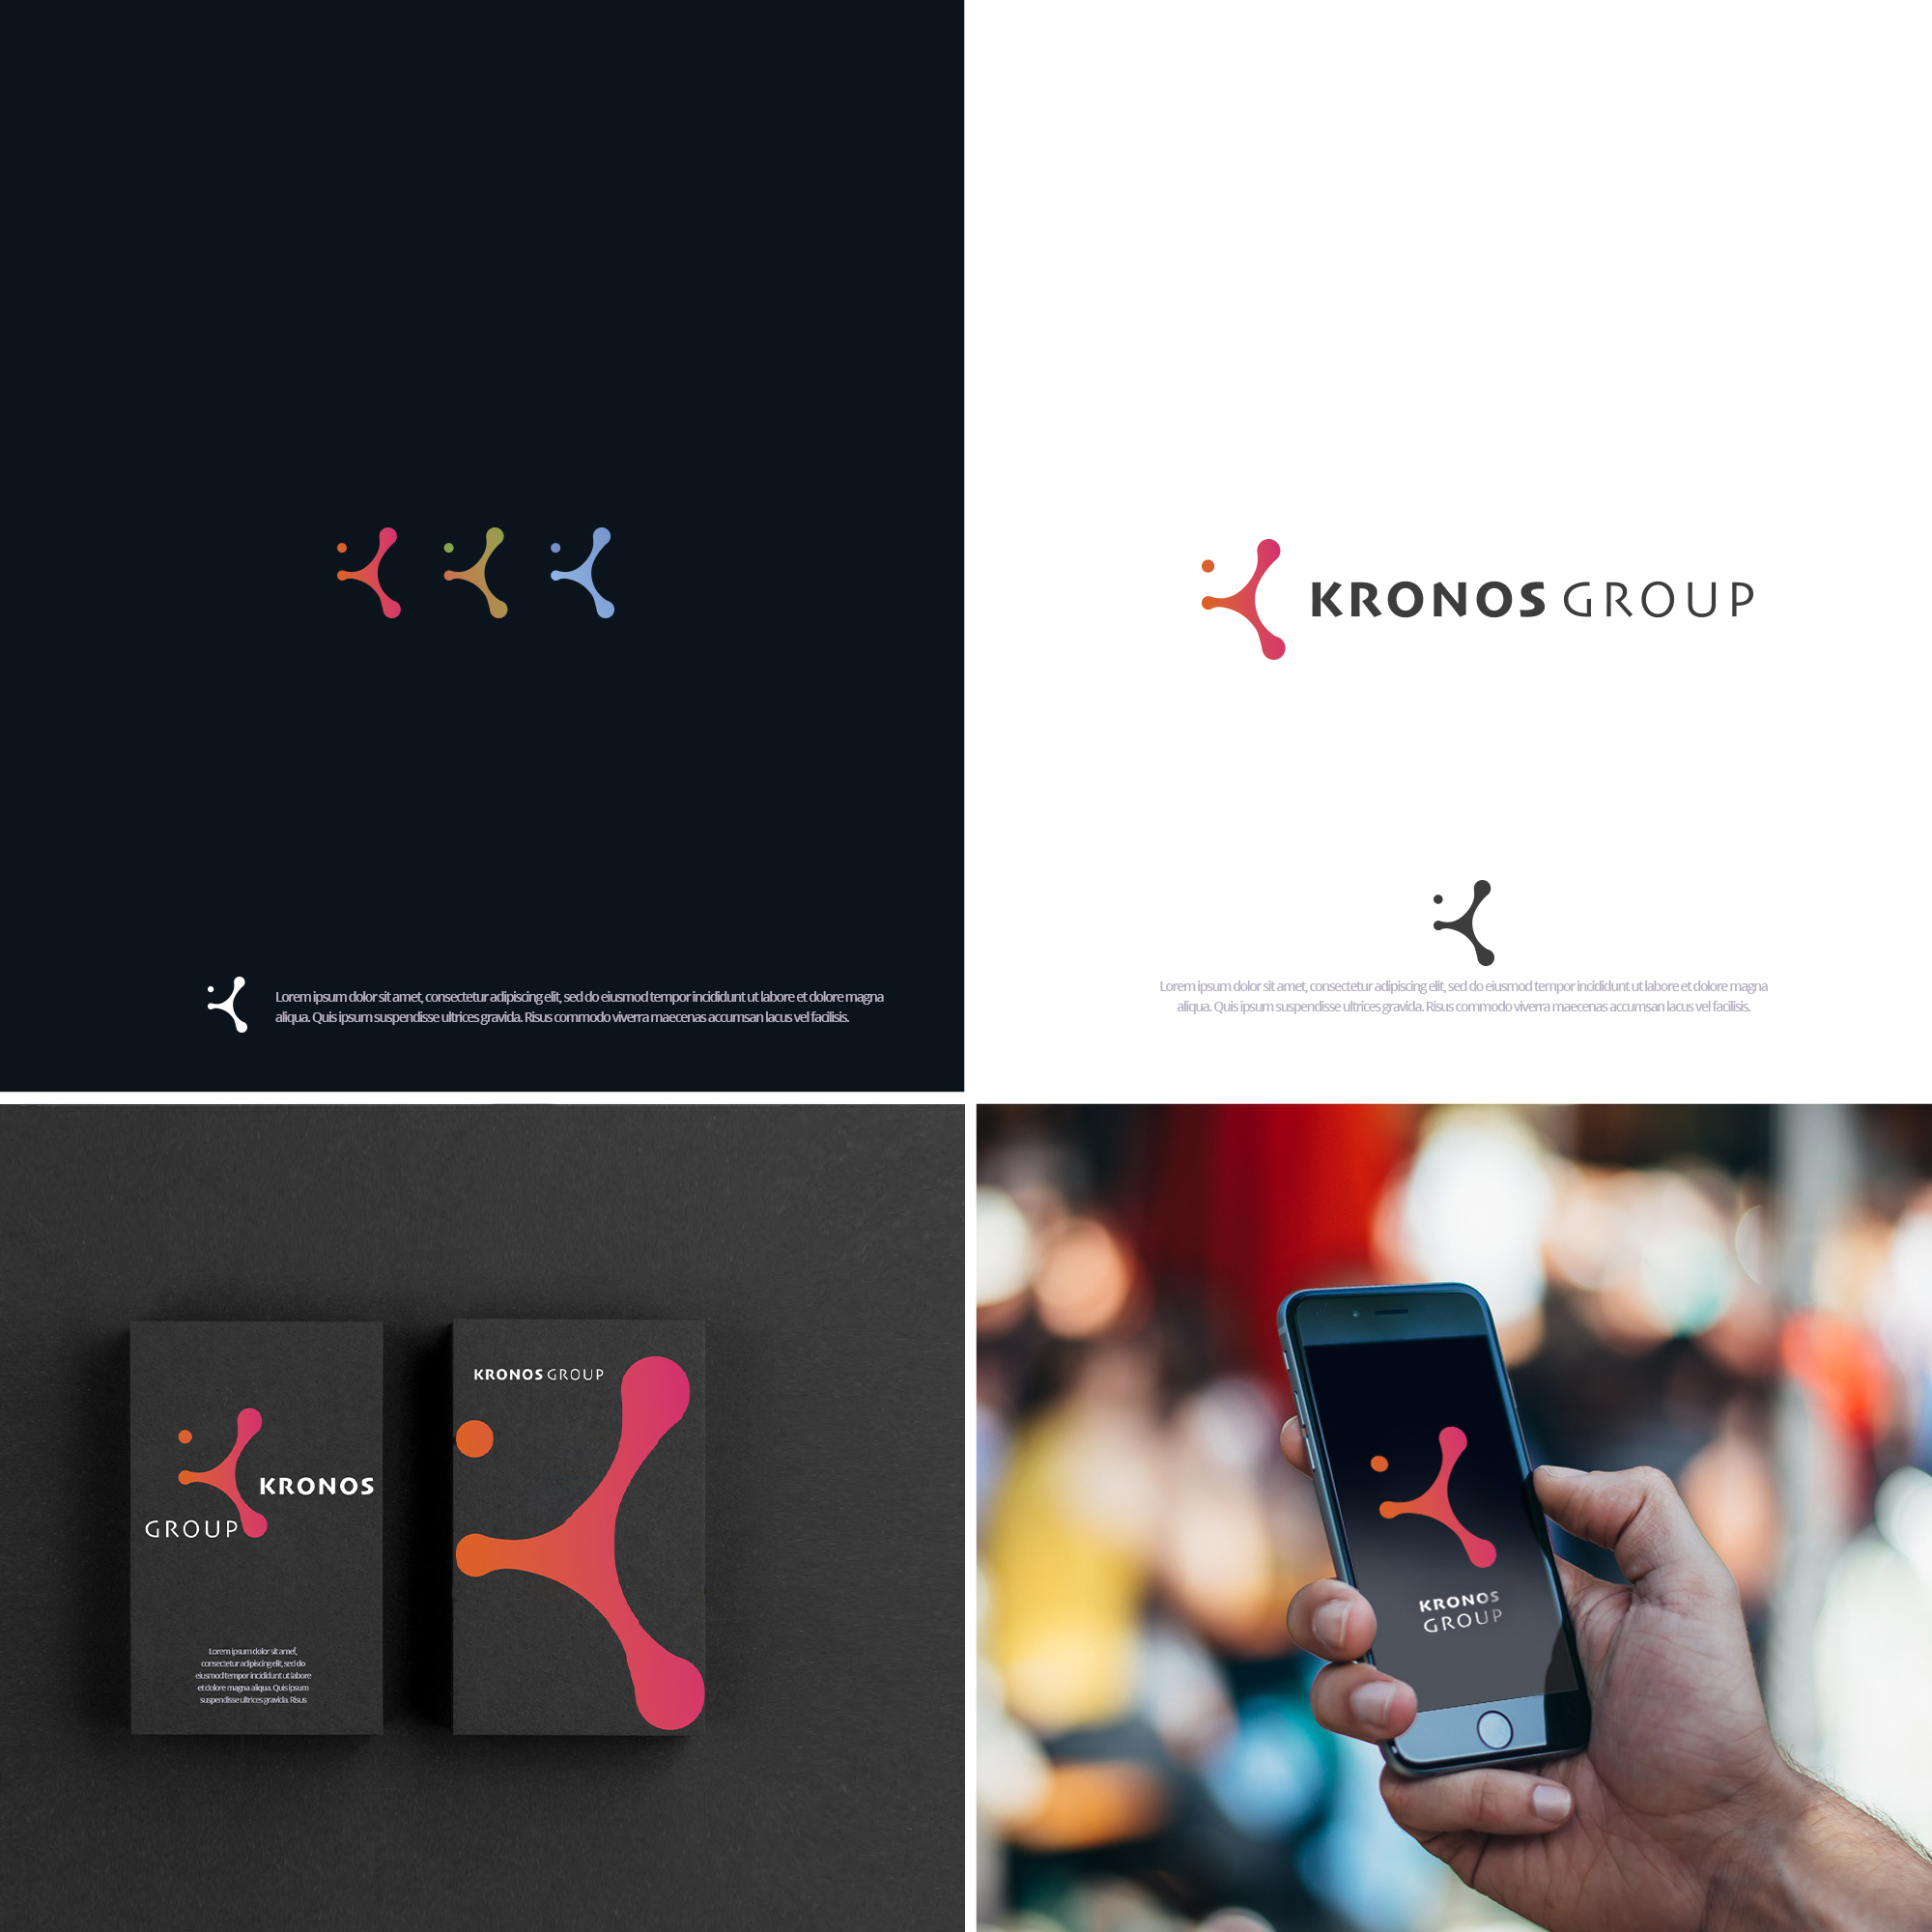 Разработать логотип KRONOS фото f_4855fb24aa9743d8.jpg